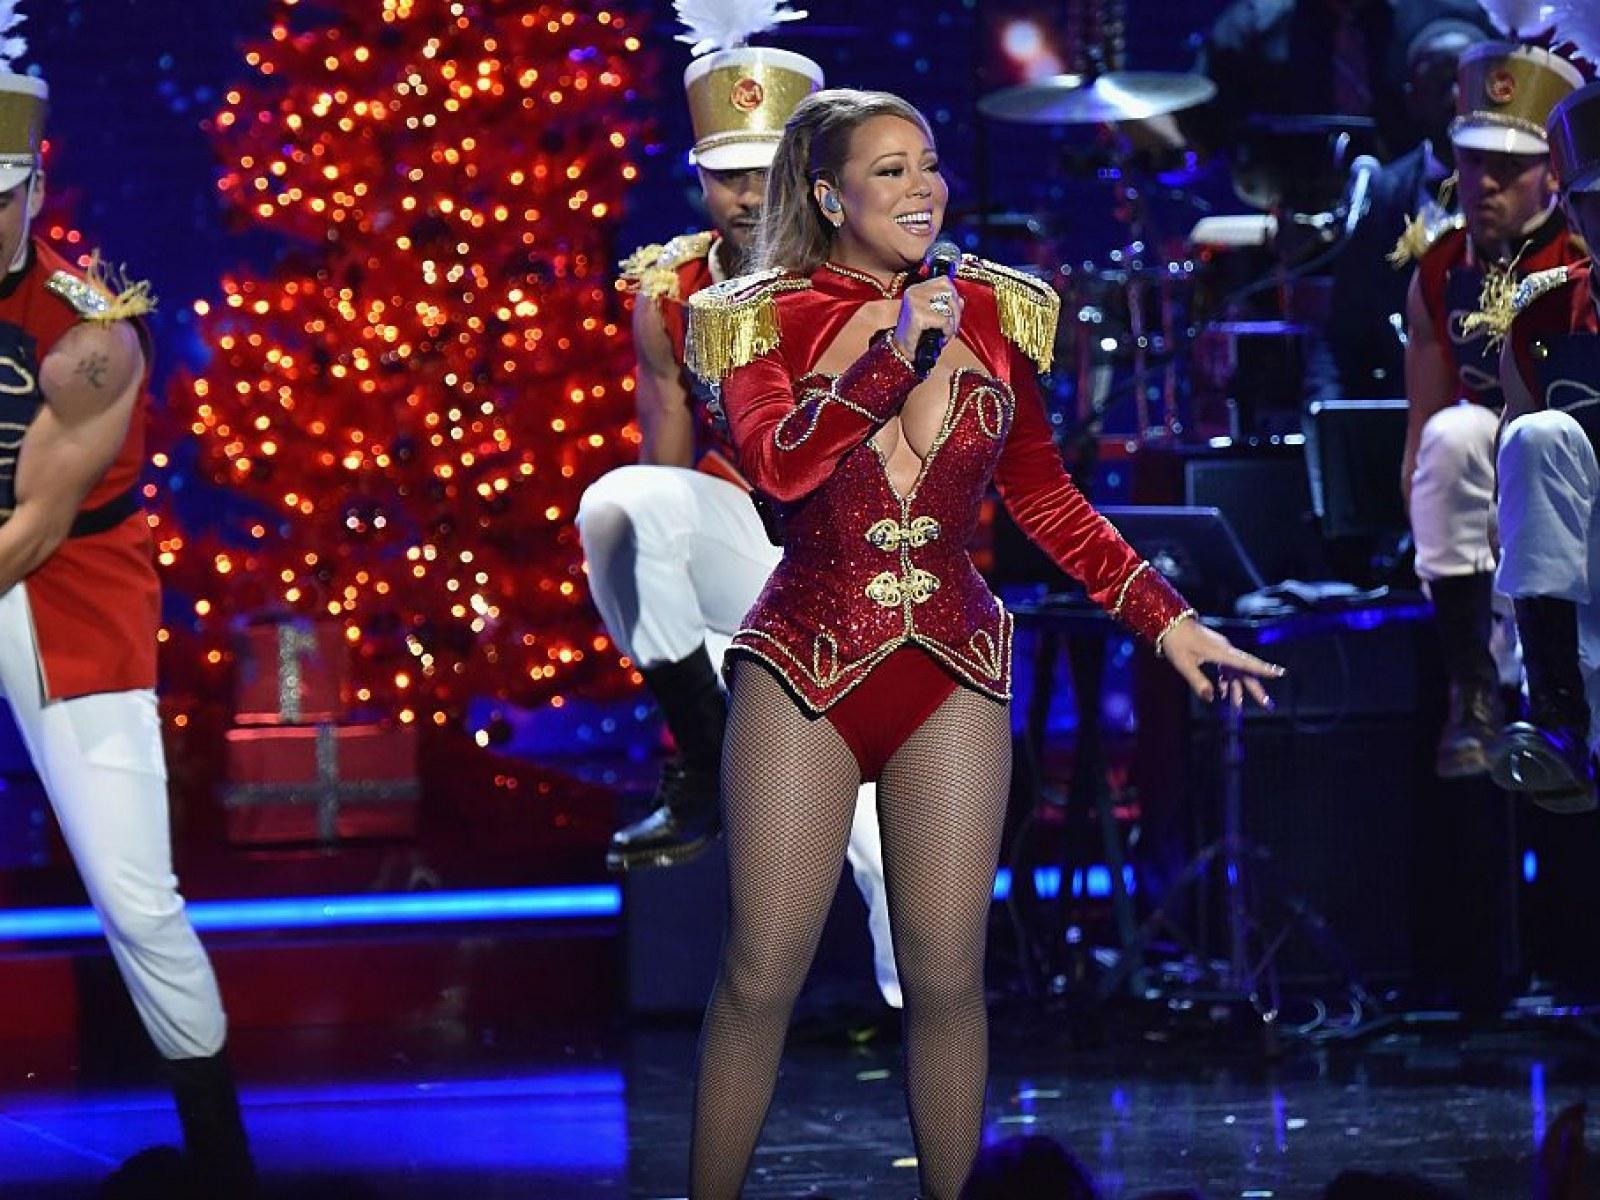 Mariah Carey Christmas Album Free Download Zip - Mariah Carey Net Worth